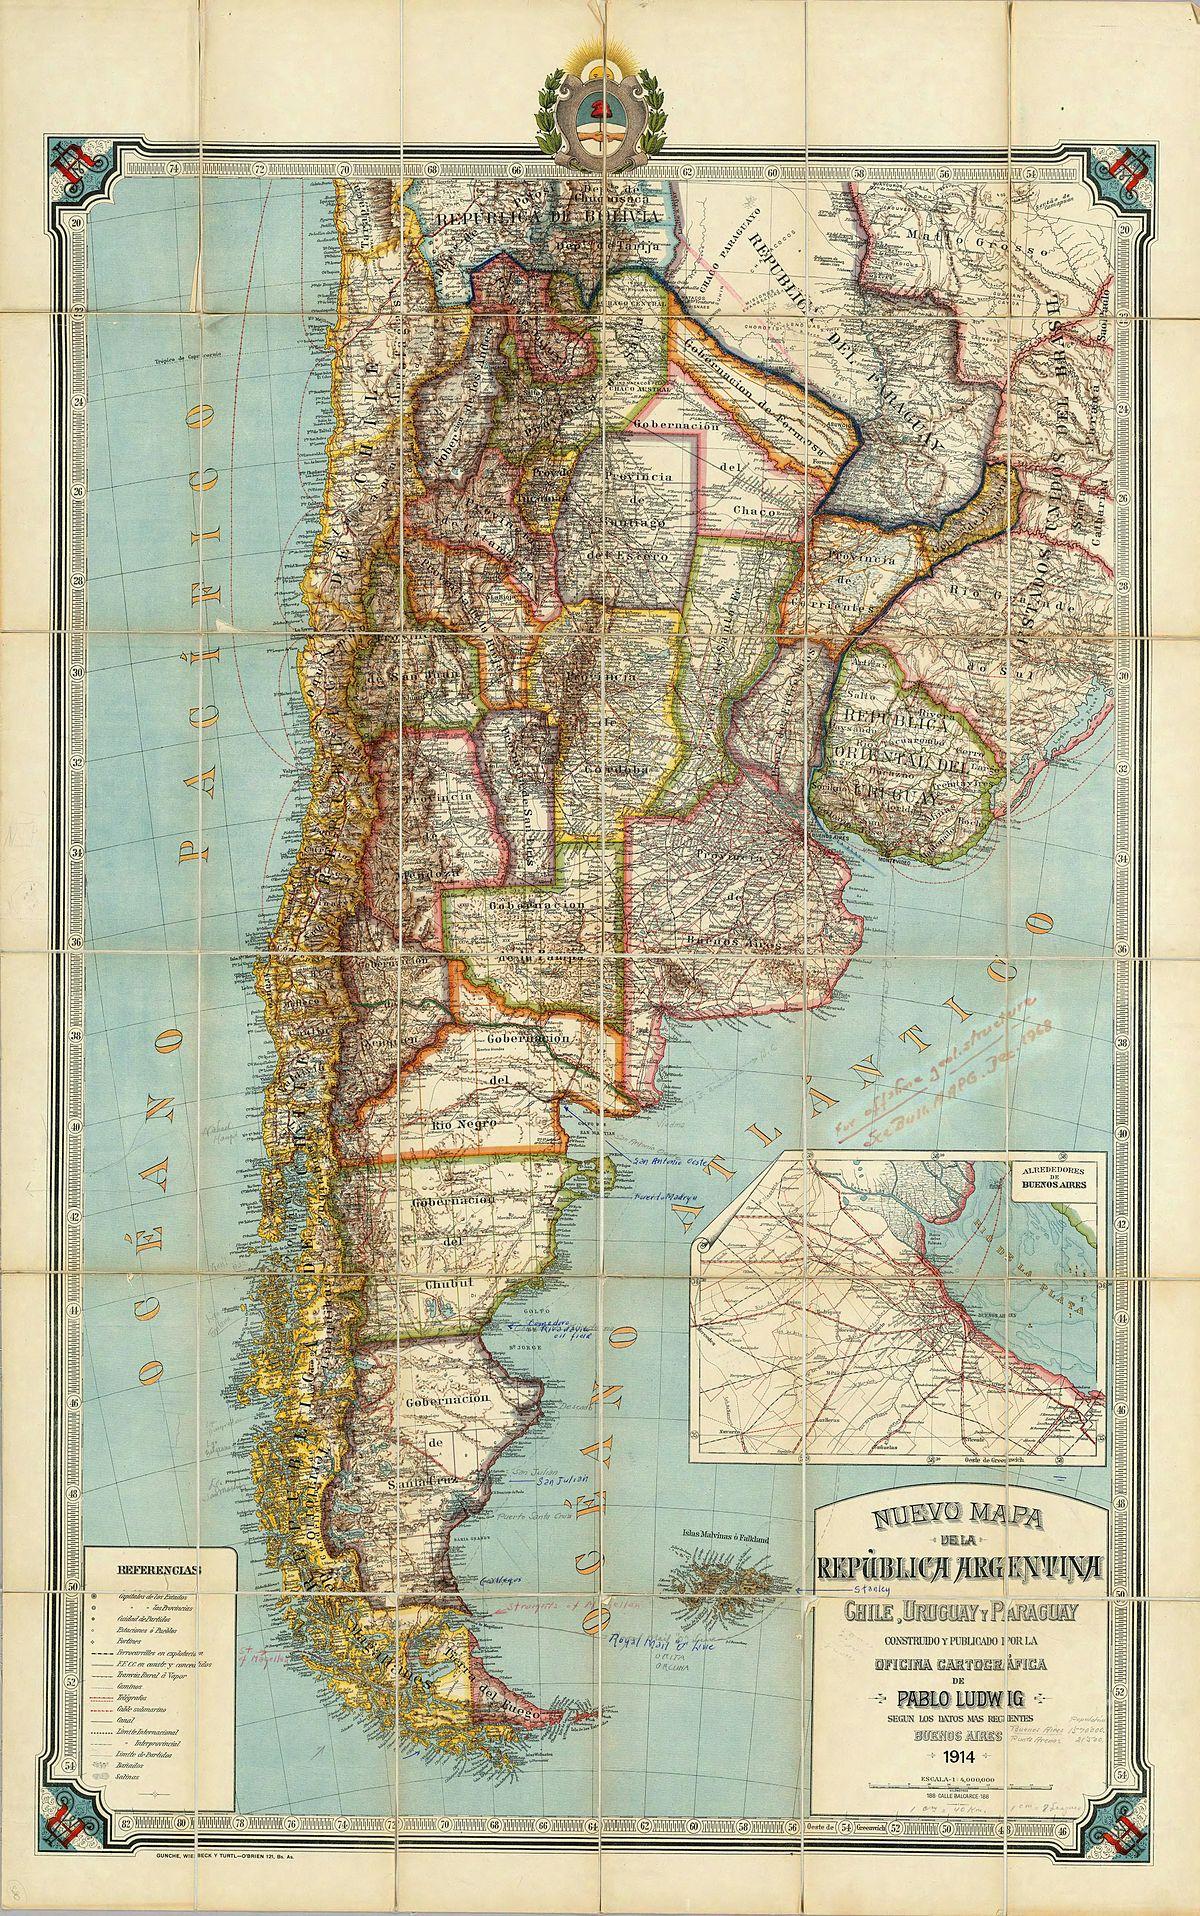 Primeras presidencias radicales (Argentina) - Wikipedia a17a781abe4